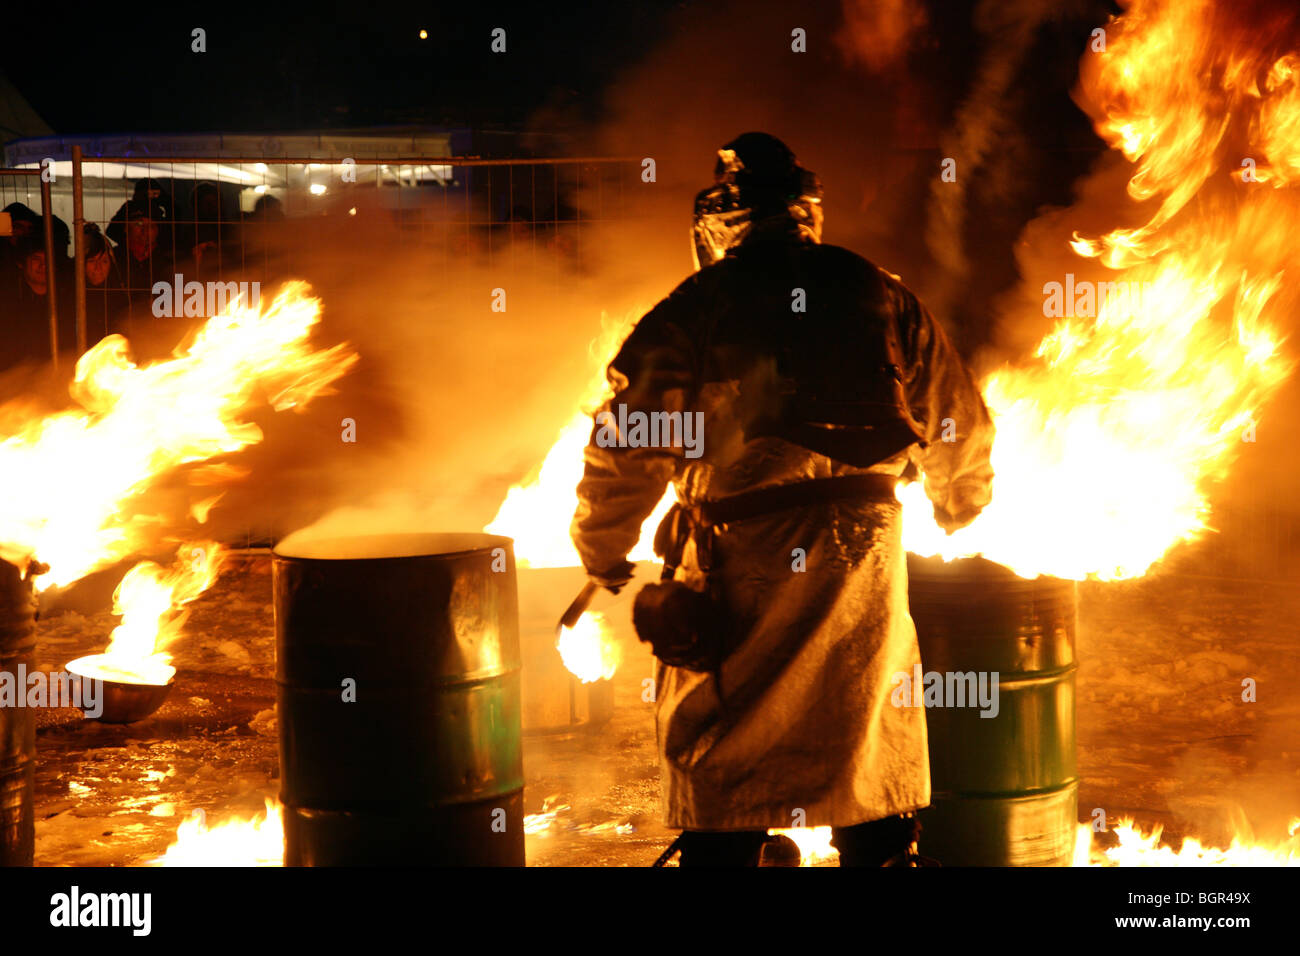 European city of culture 2010 Essen Germany, Zeche-Zollverein, World Cultural Heritage, fireman, fire - Stock Image